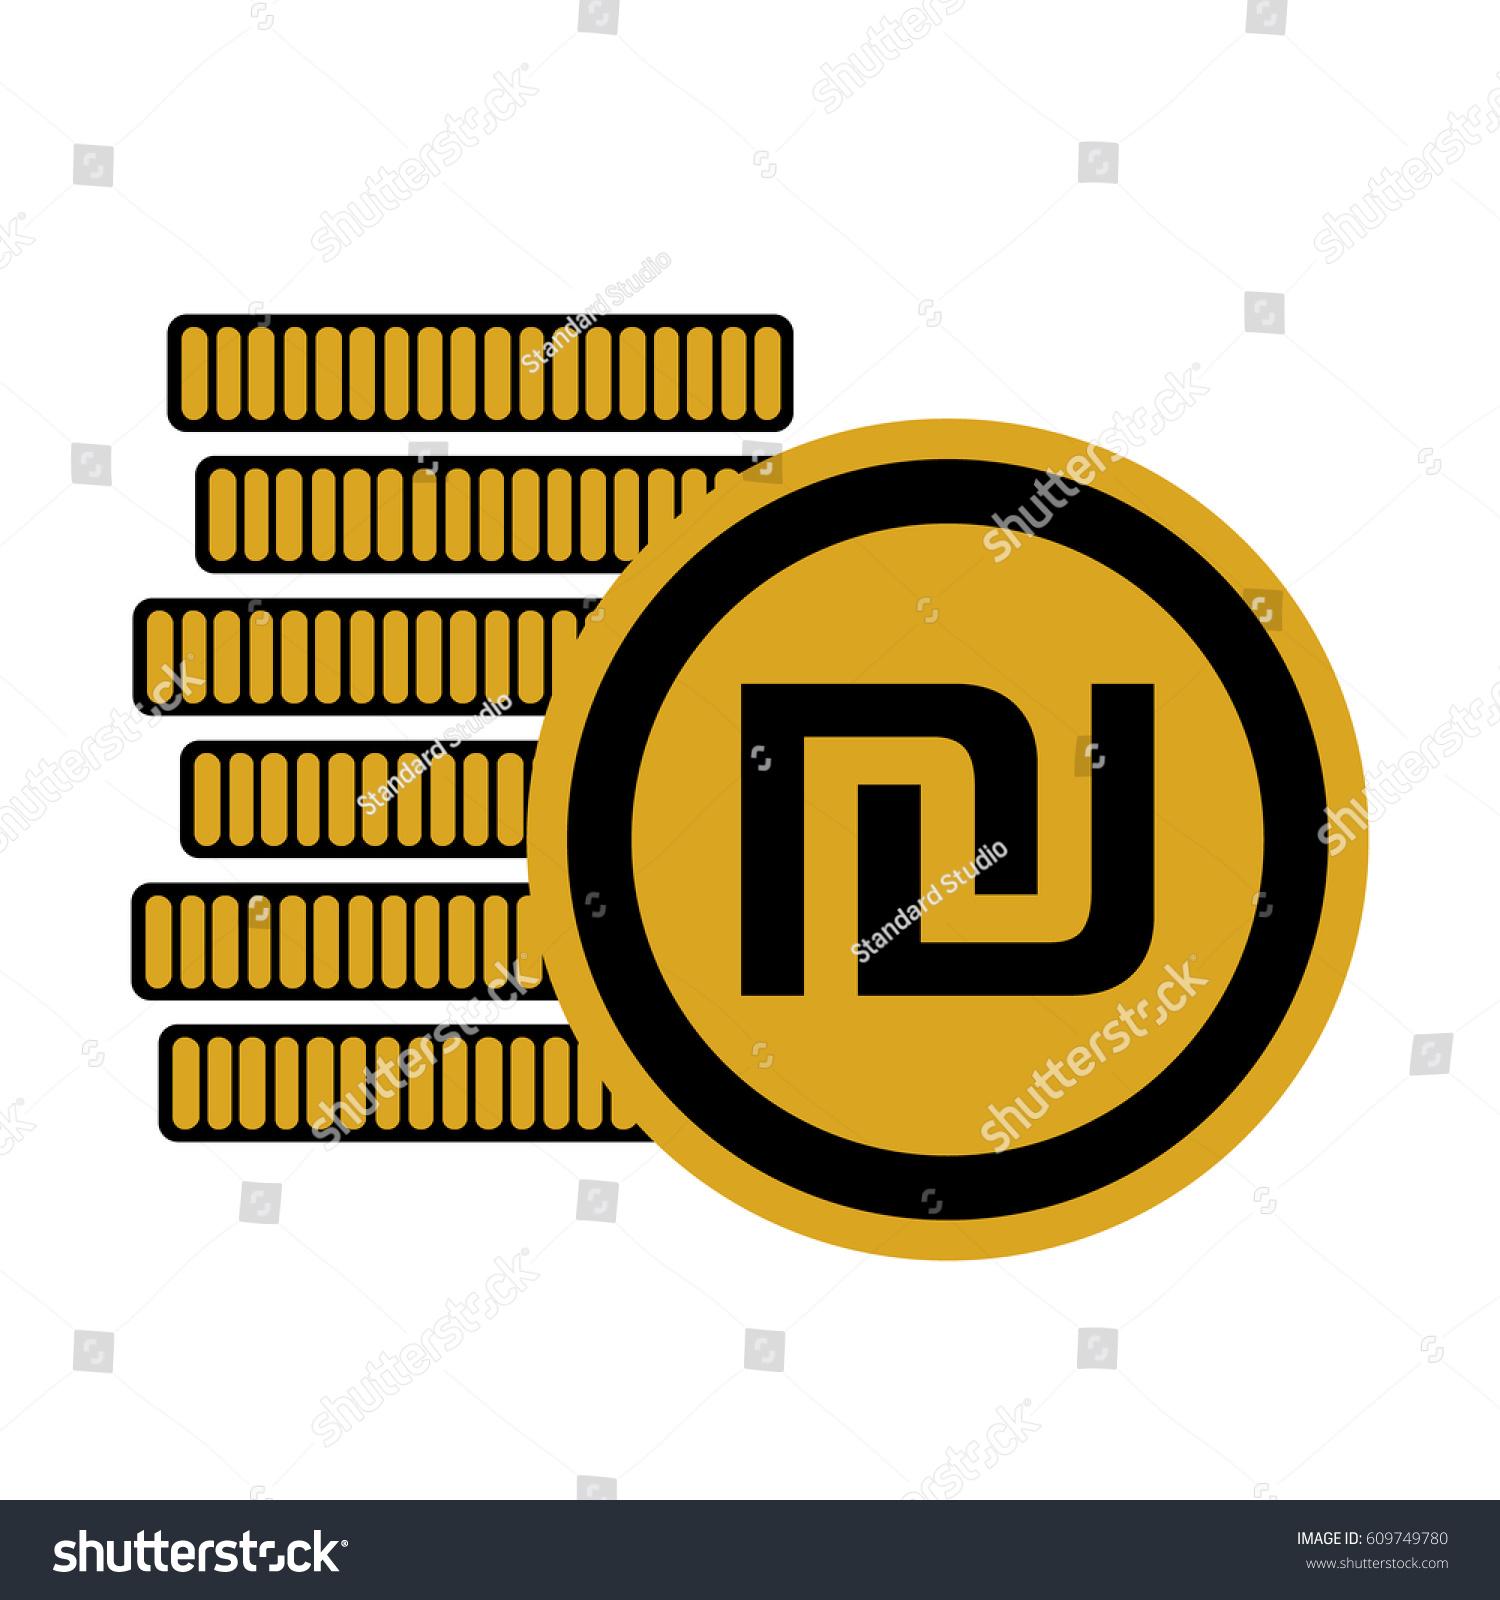 Money Six Golden Coins Israeli Shekel Stock Photo Photo Vector